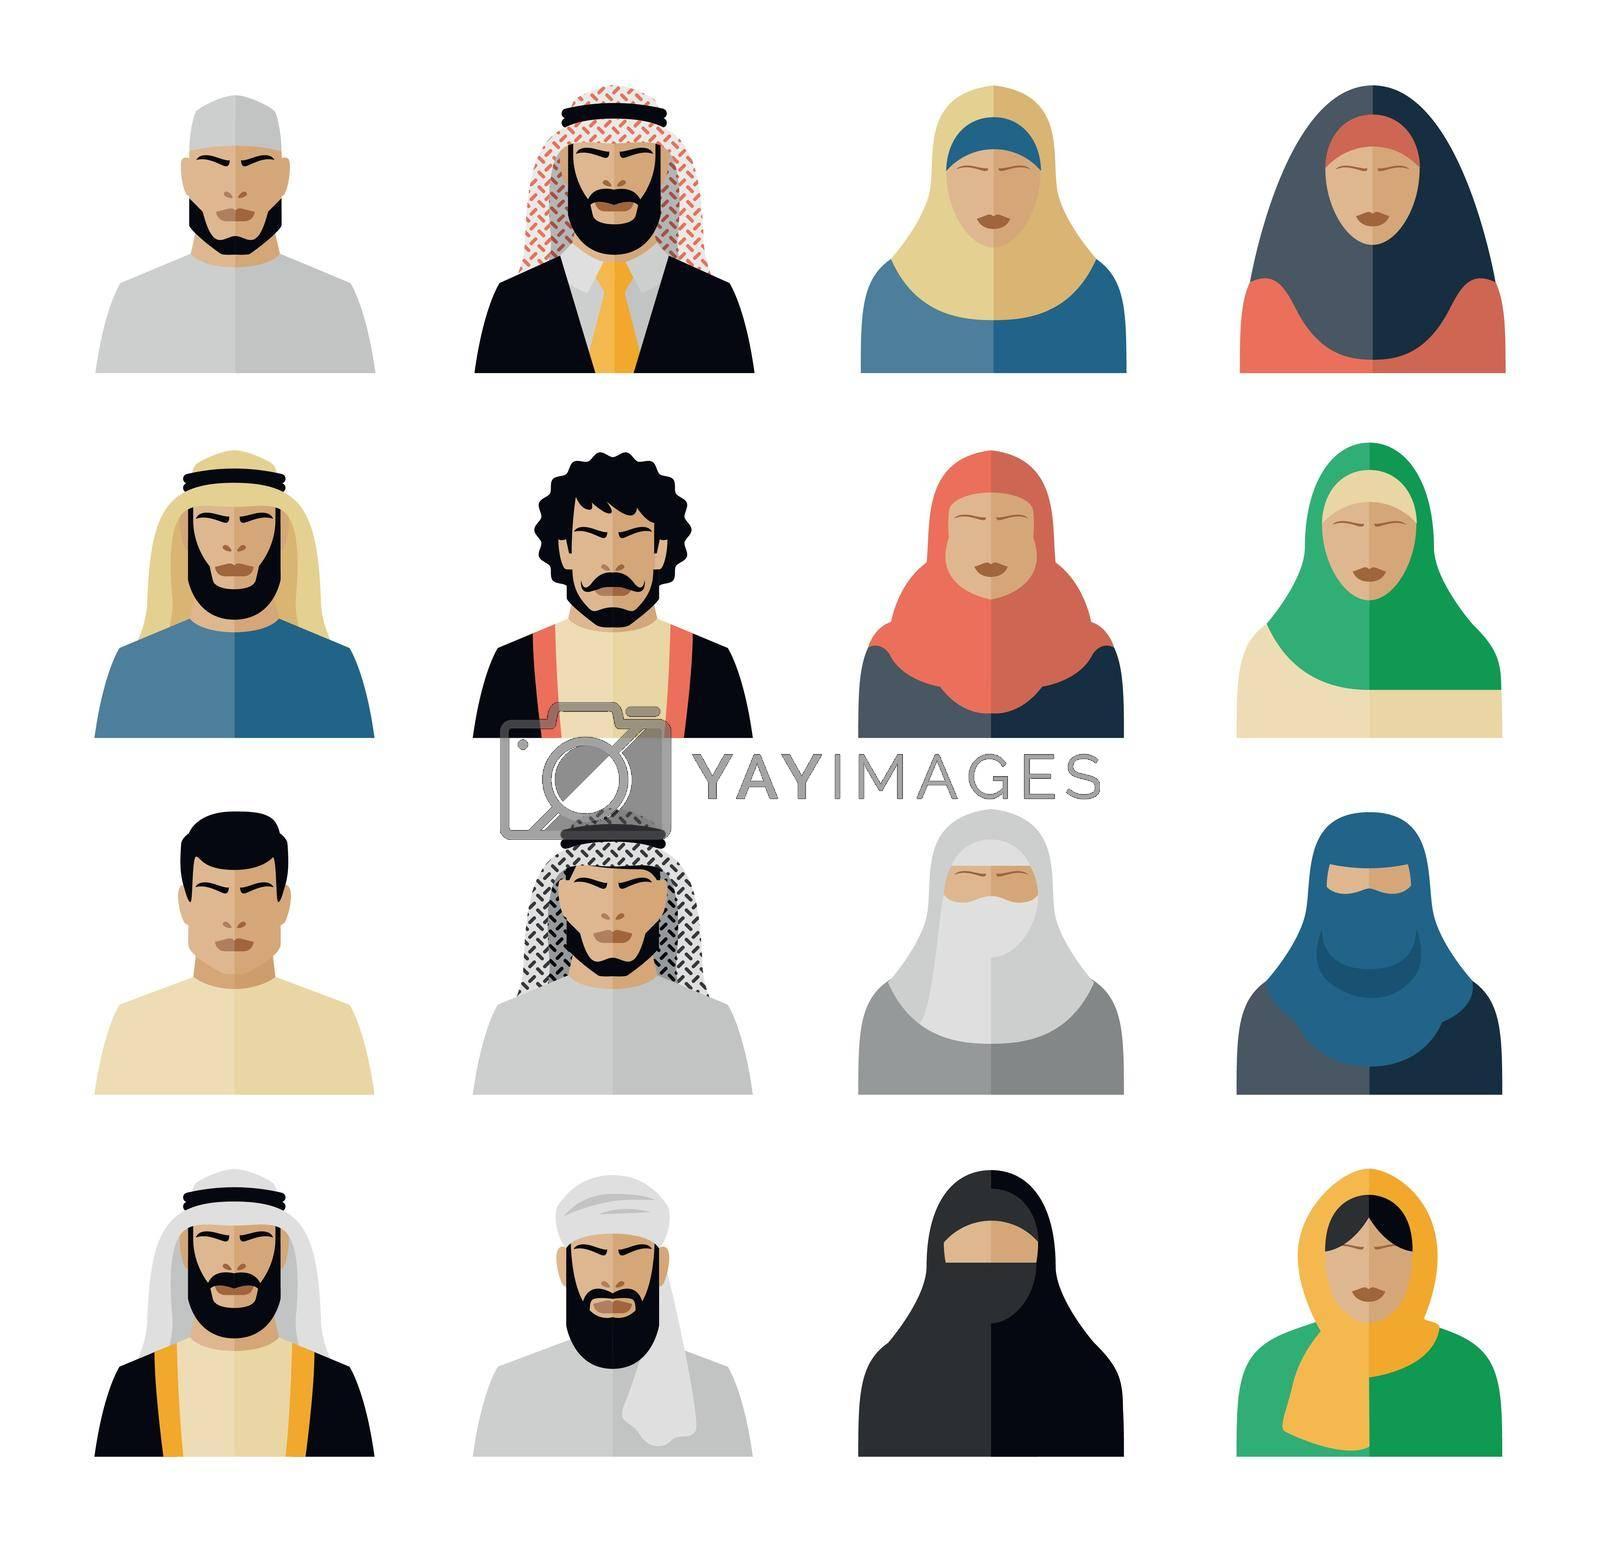 Royalty free image of Arab people icons by mstjahanara